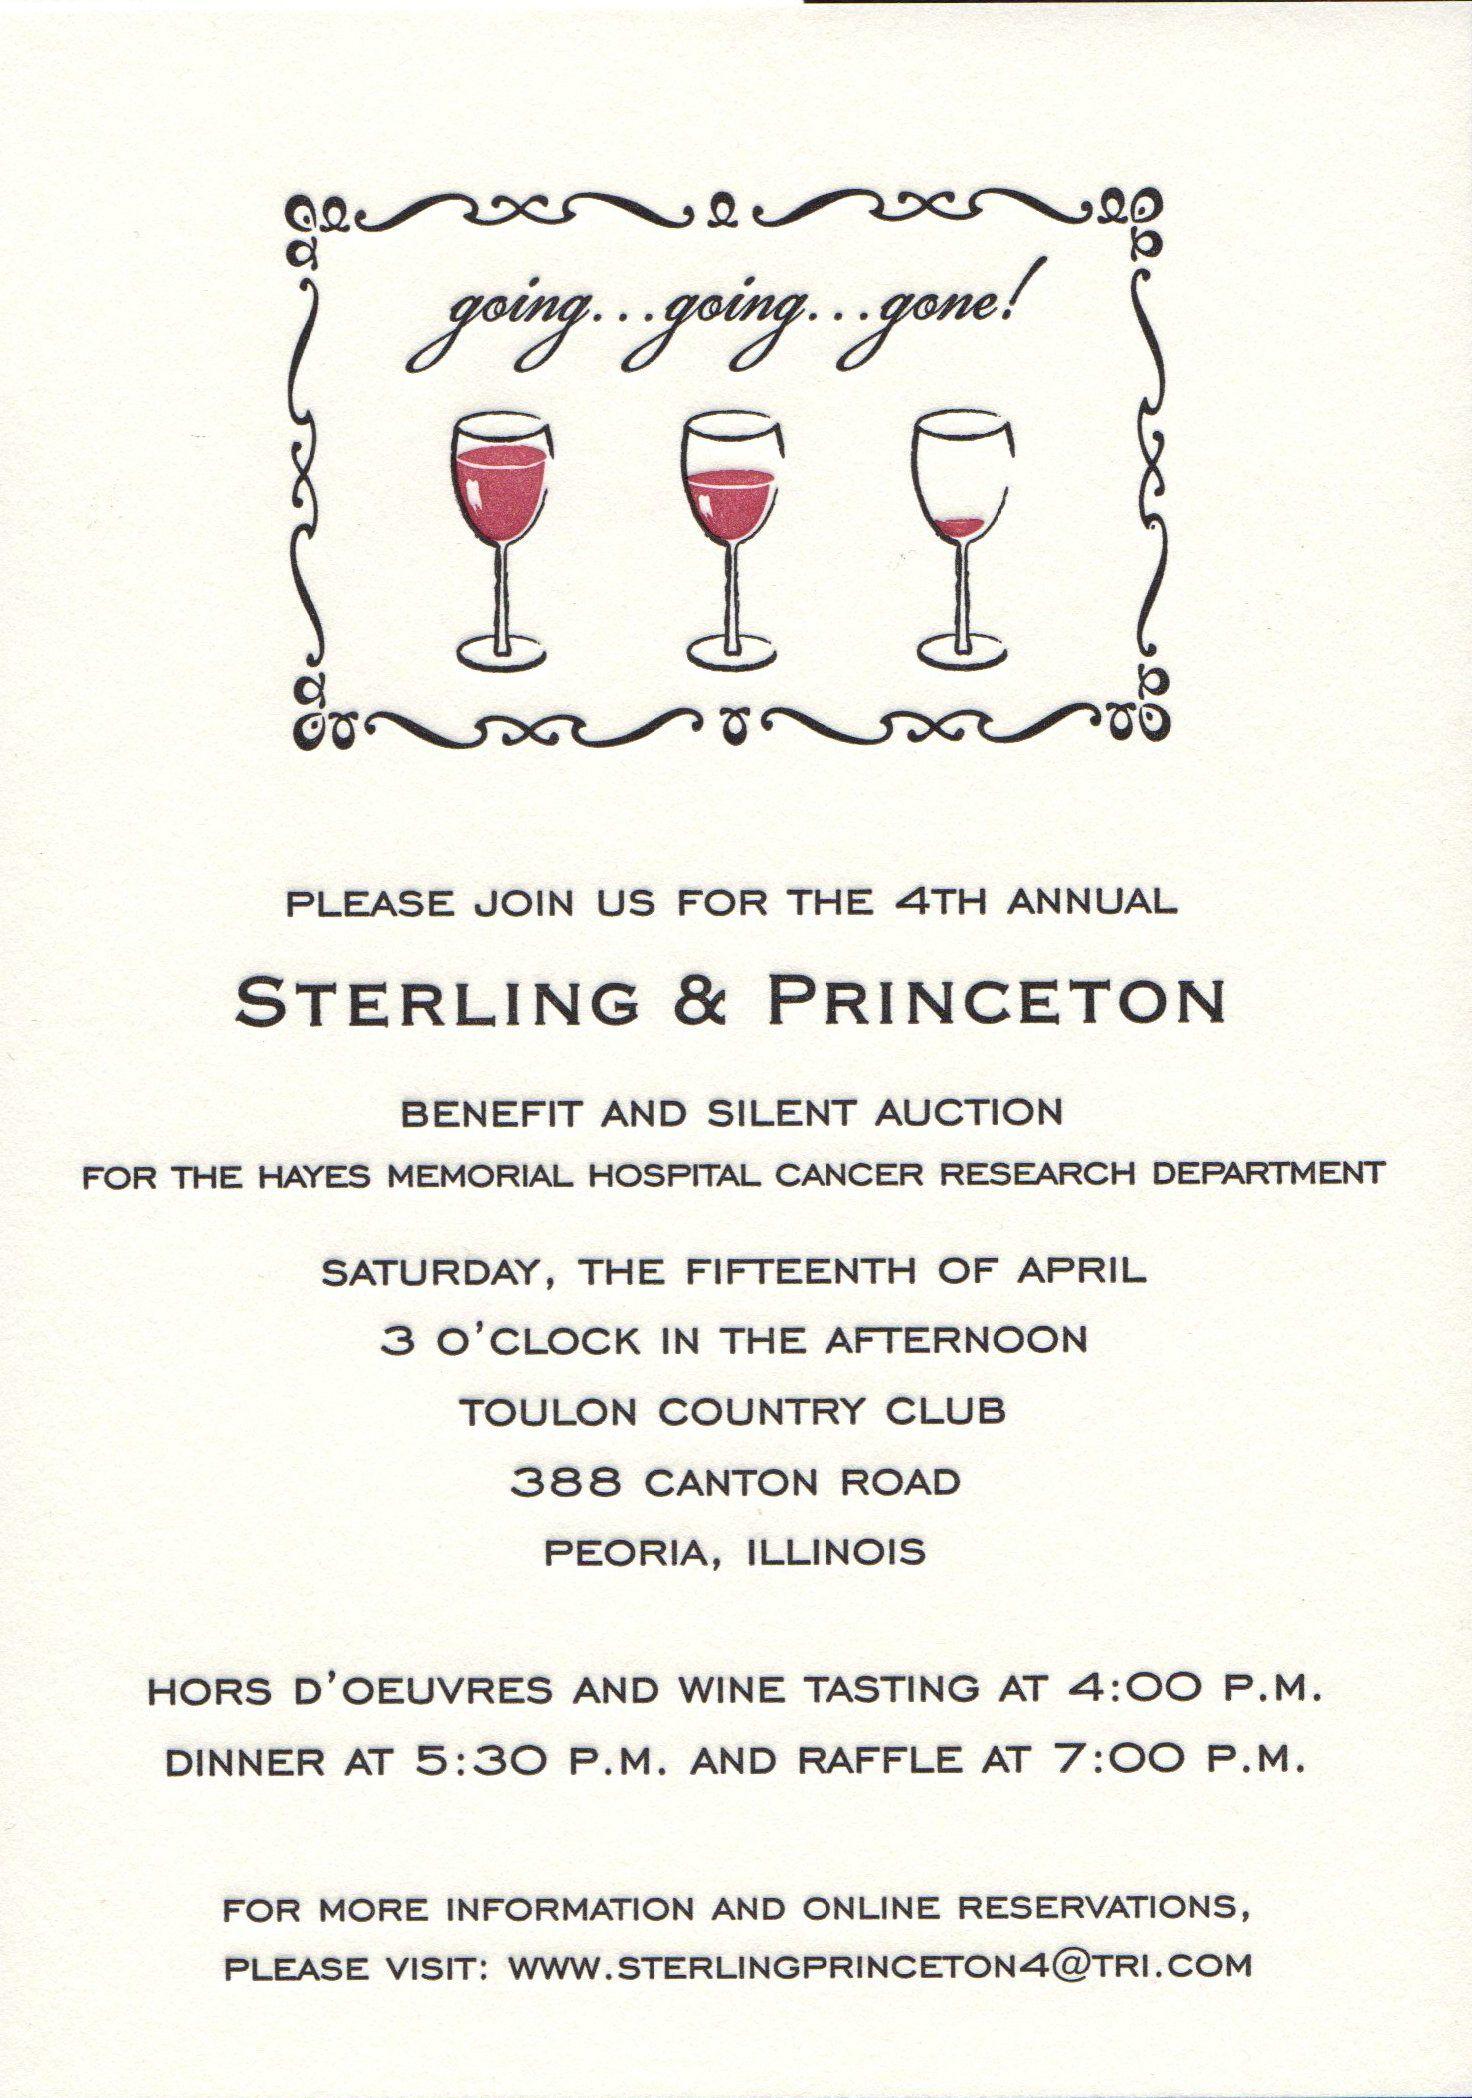 going going gone wine themed letterpress invitation from